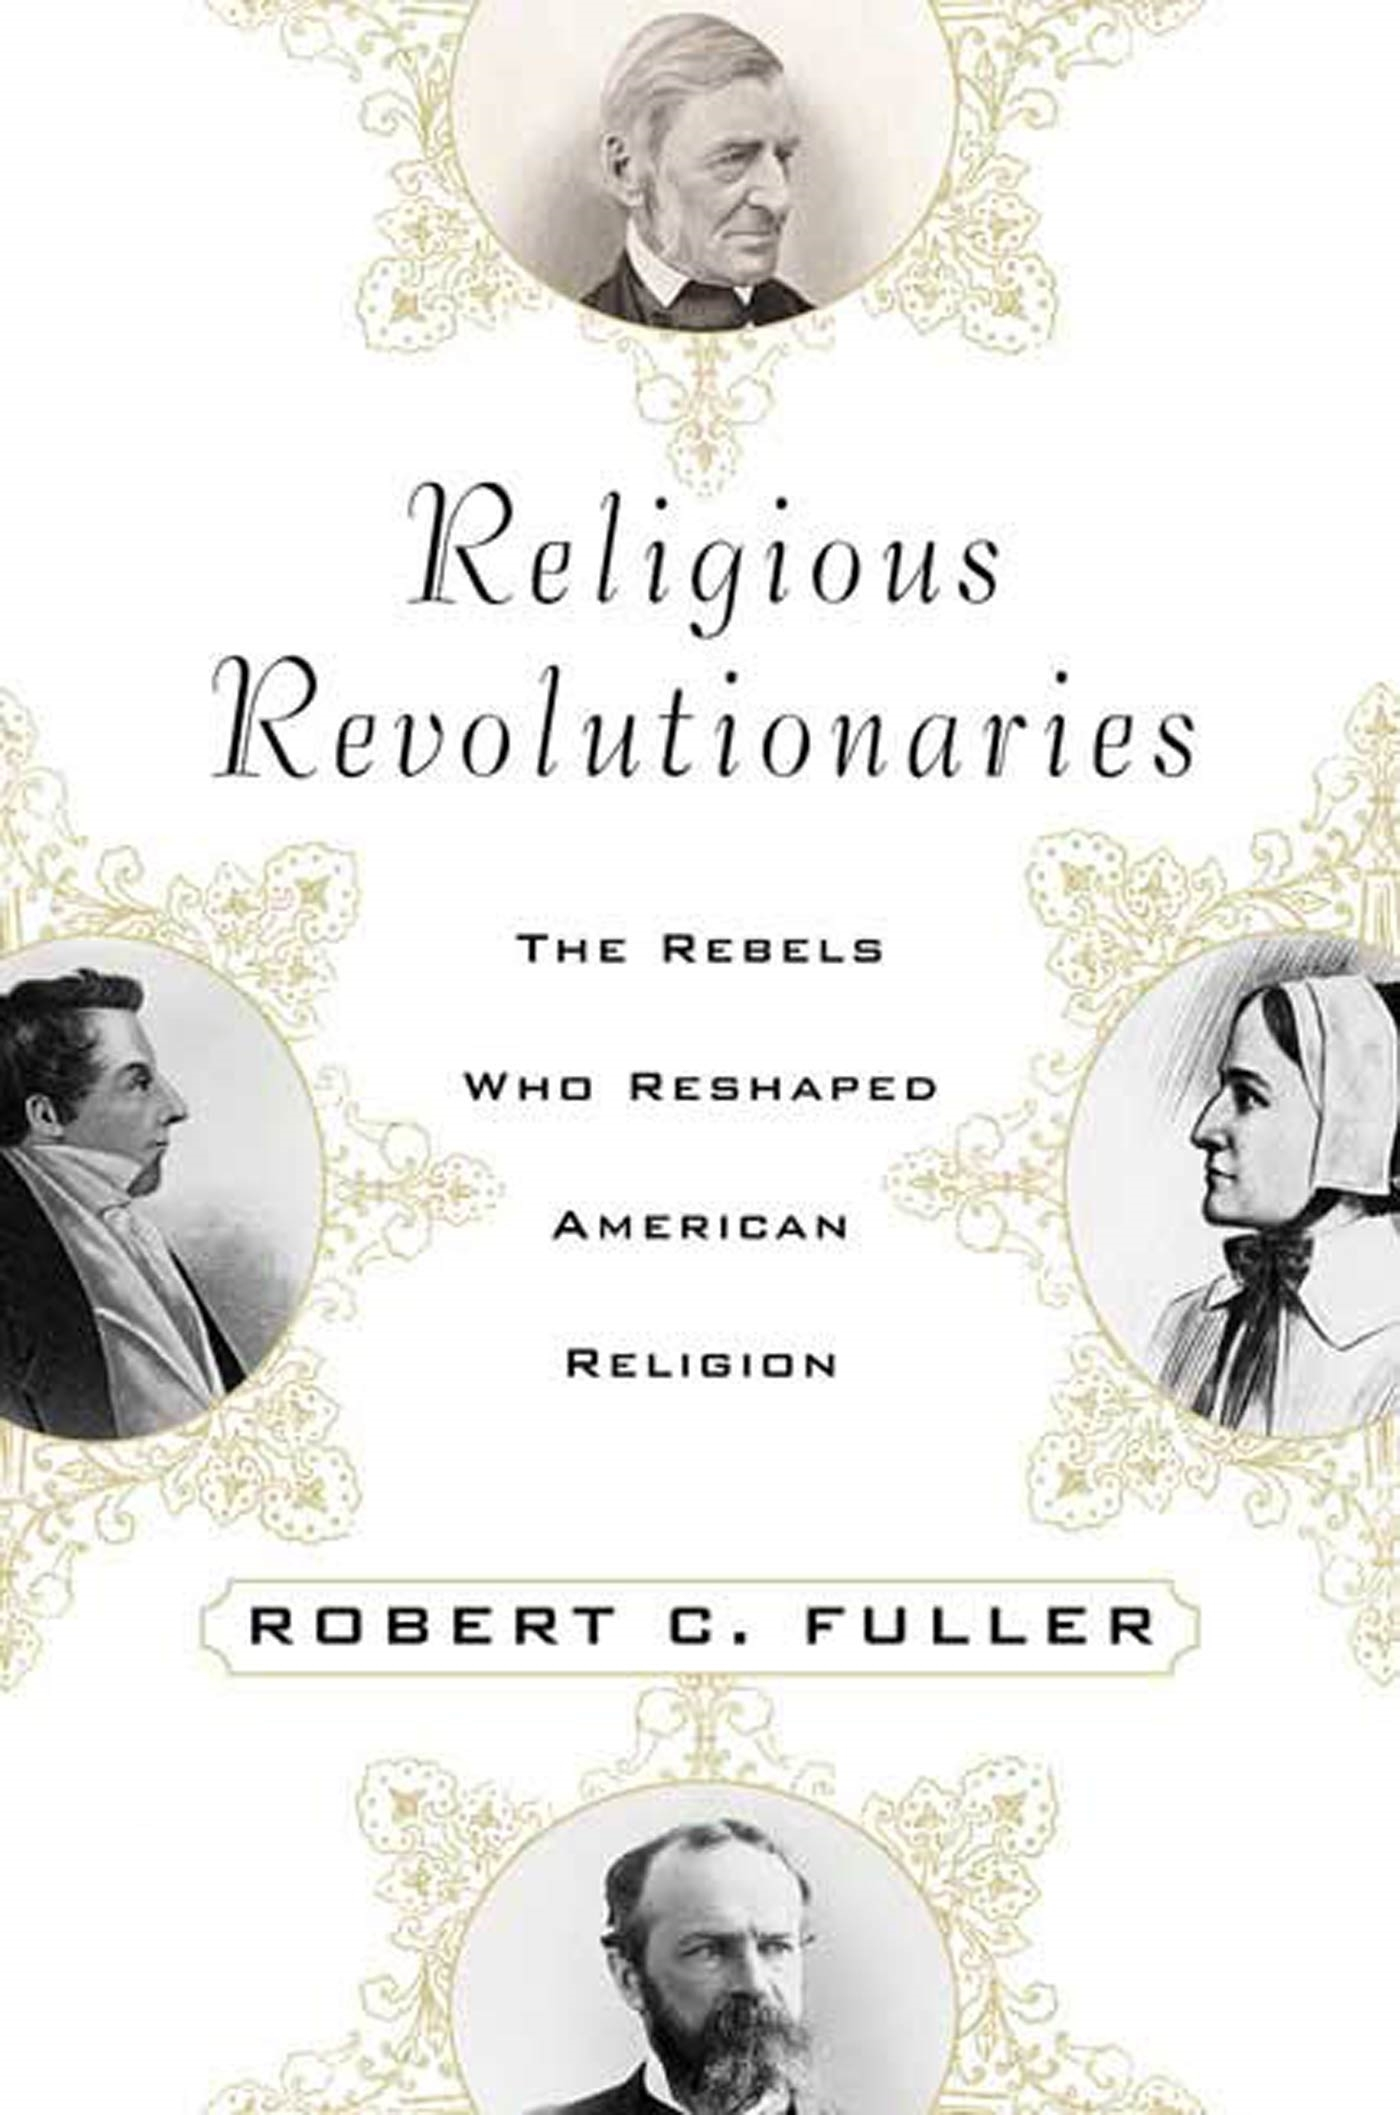 Religious Revolutionaries: The Rebels Who Reshaped American Religion Robert C. Fuller